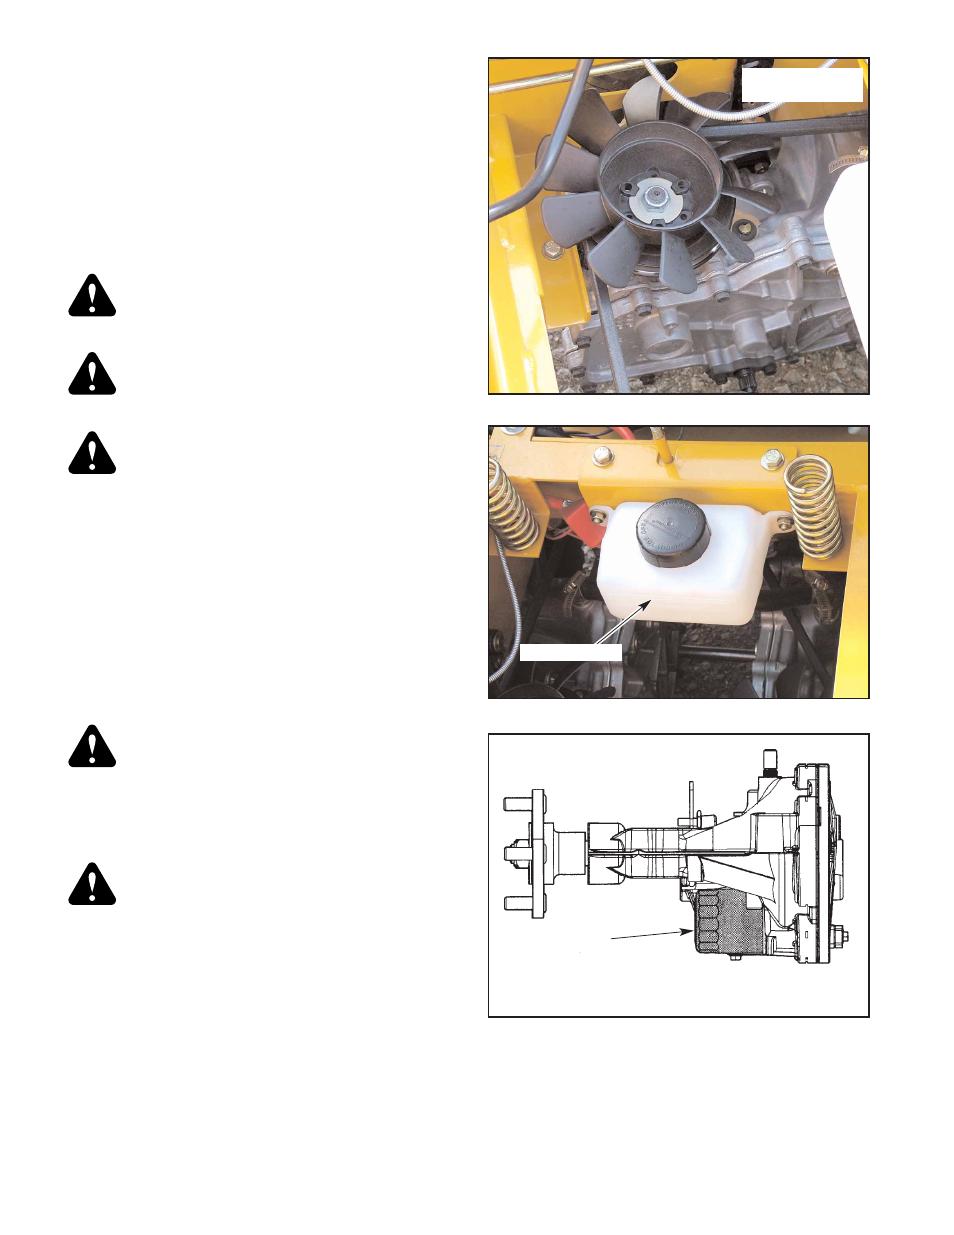 Hustler Turf FasTrak Super Duty 36 User Manual | Page 21 / 34